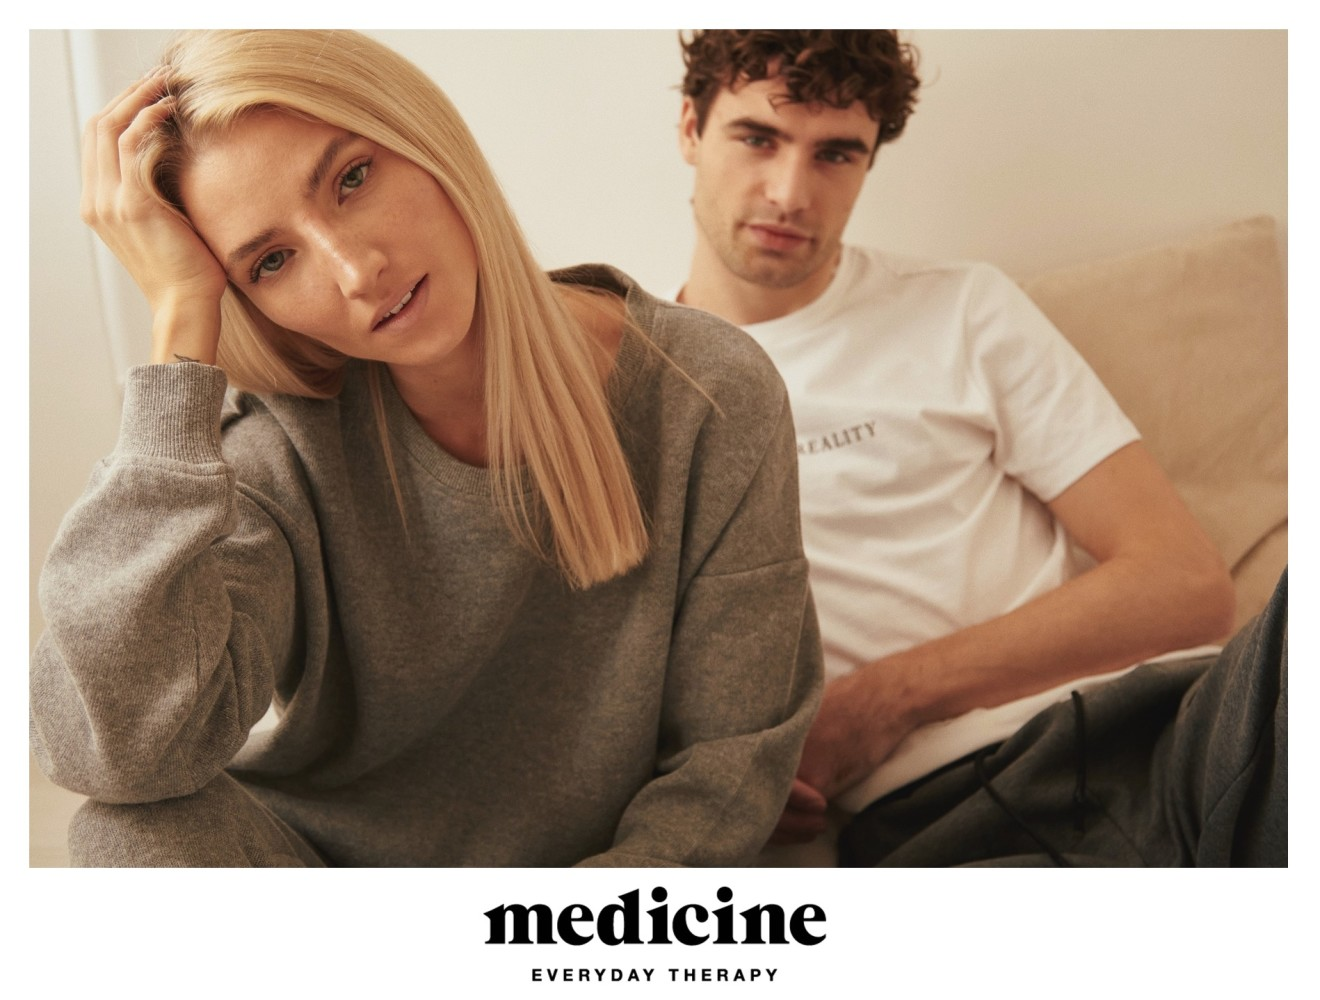 Agata Sieramska & Bartek Mroz for MEDICINE Homewear new collection